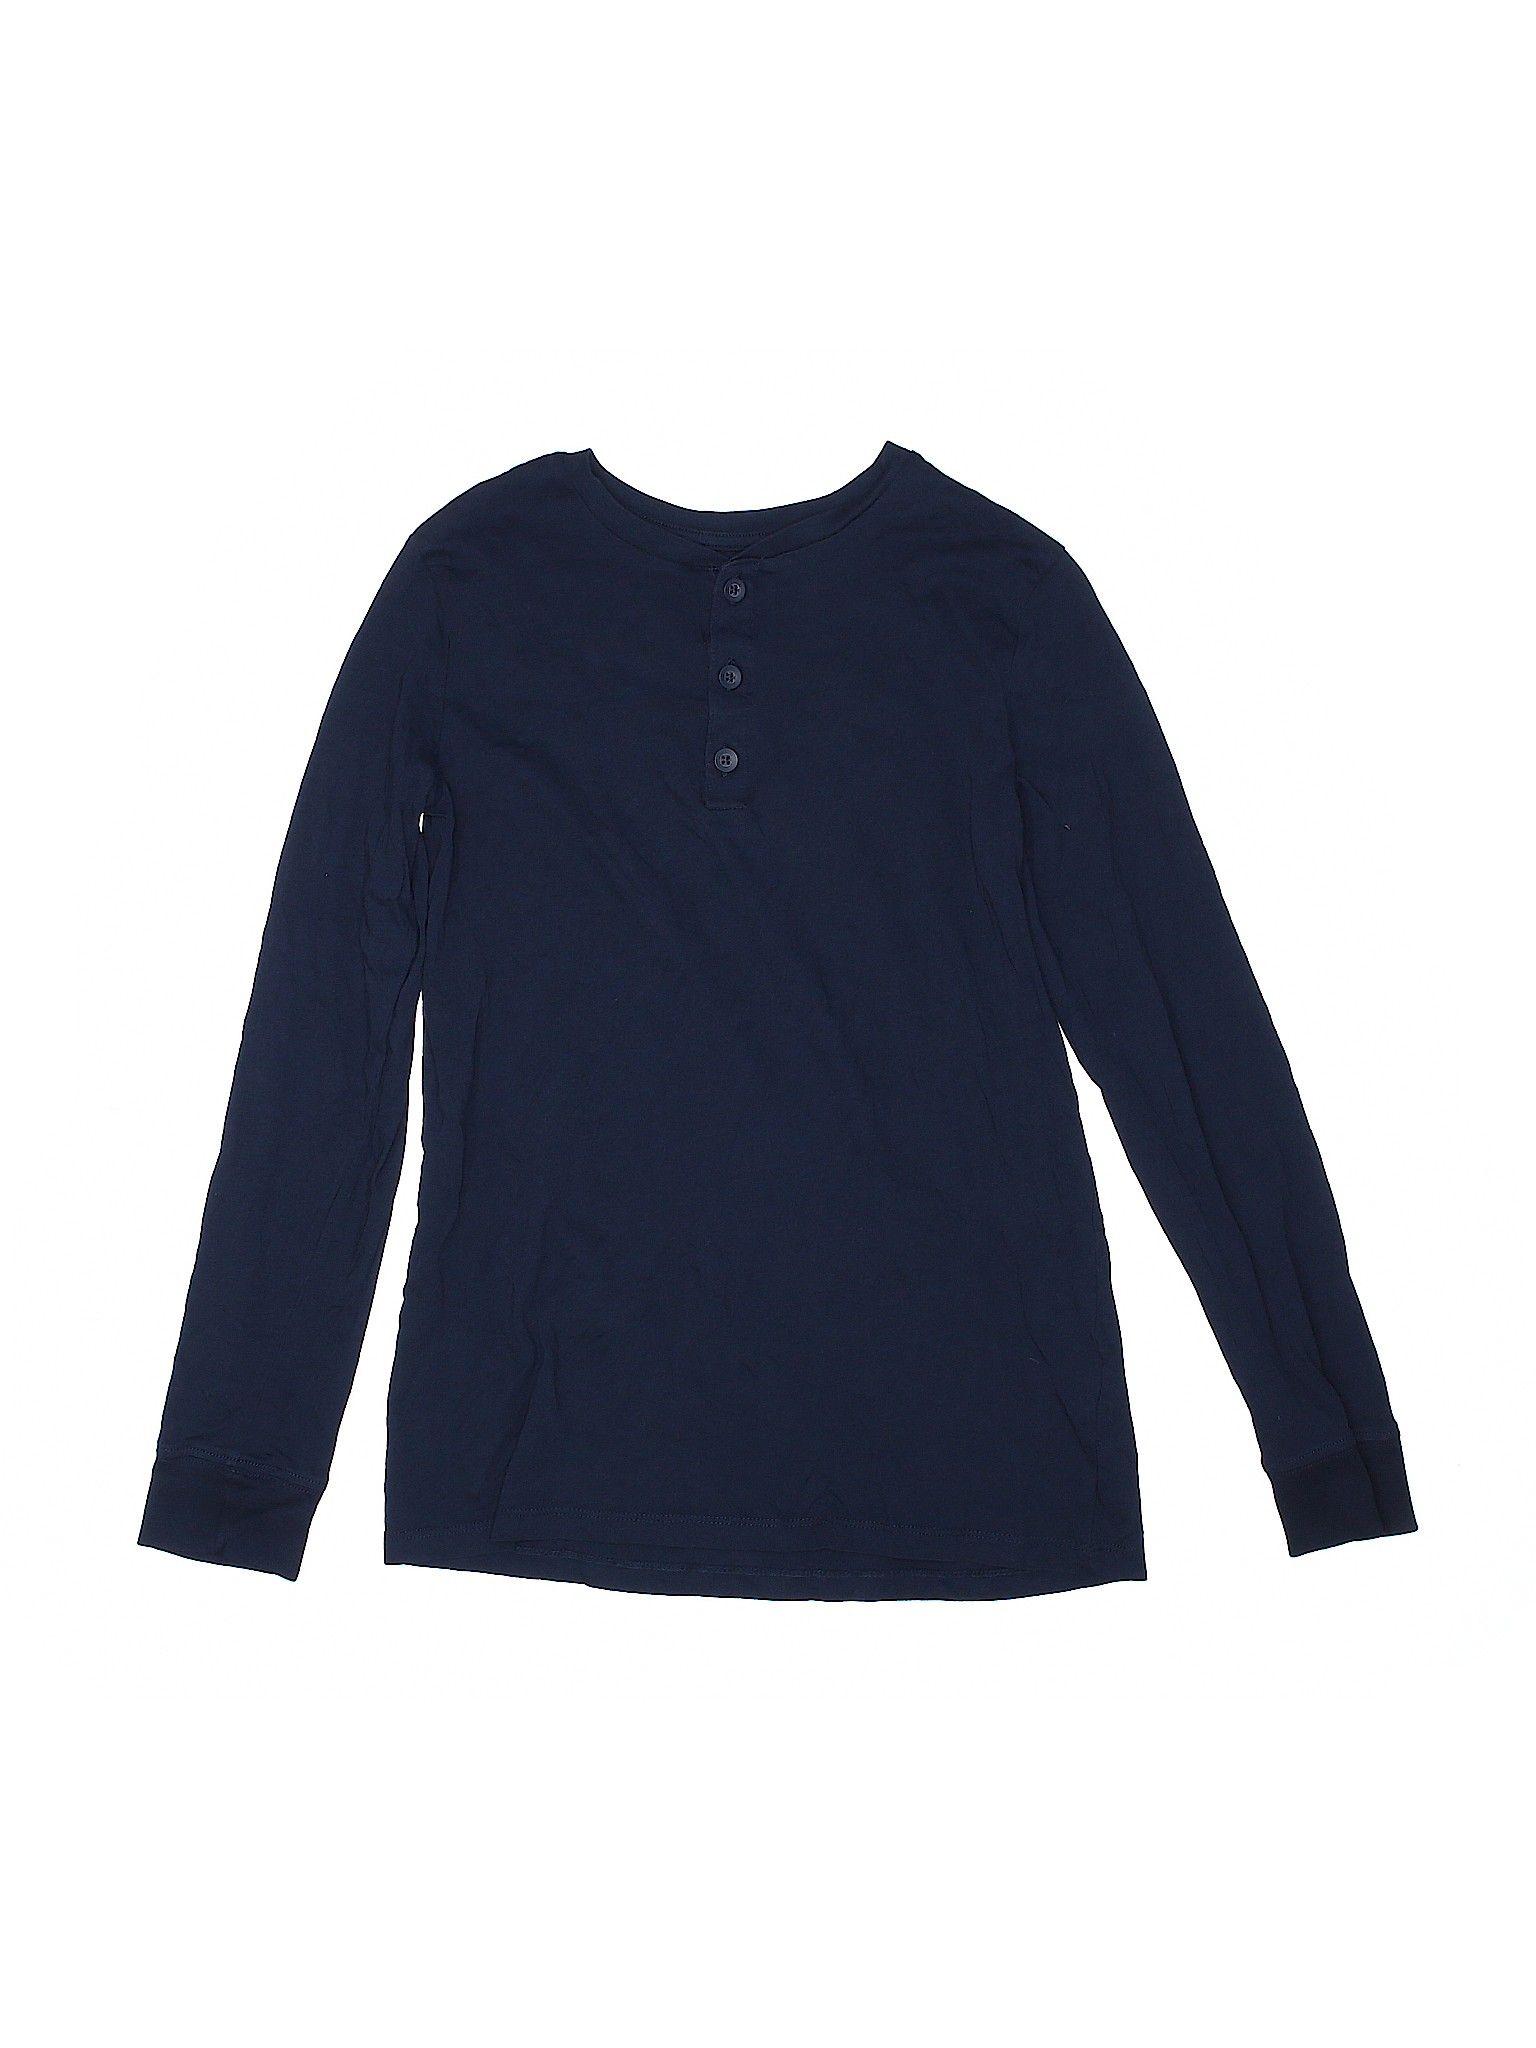 H & M Long Sleeve Henley Shirt 12: Blue Solid Boy's Tops